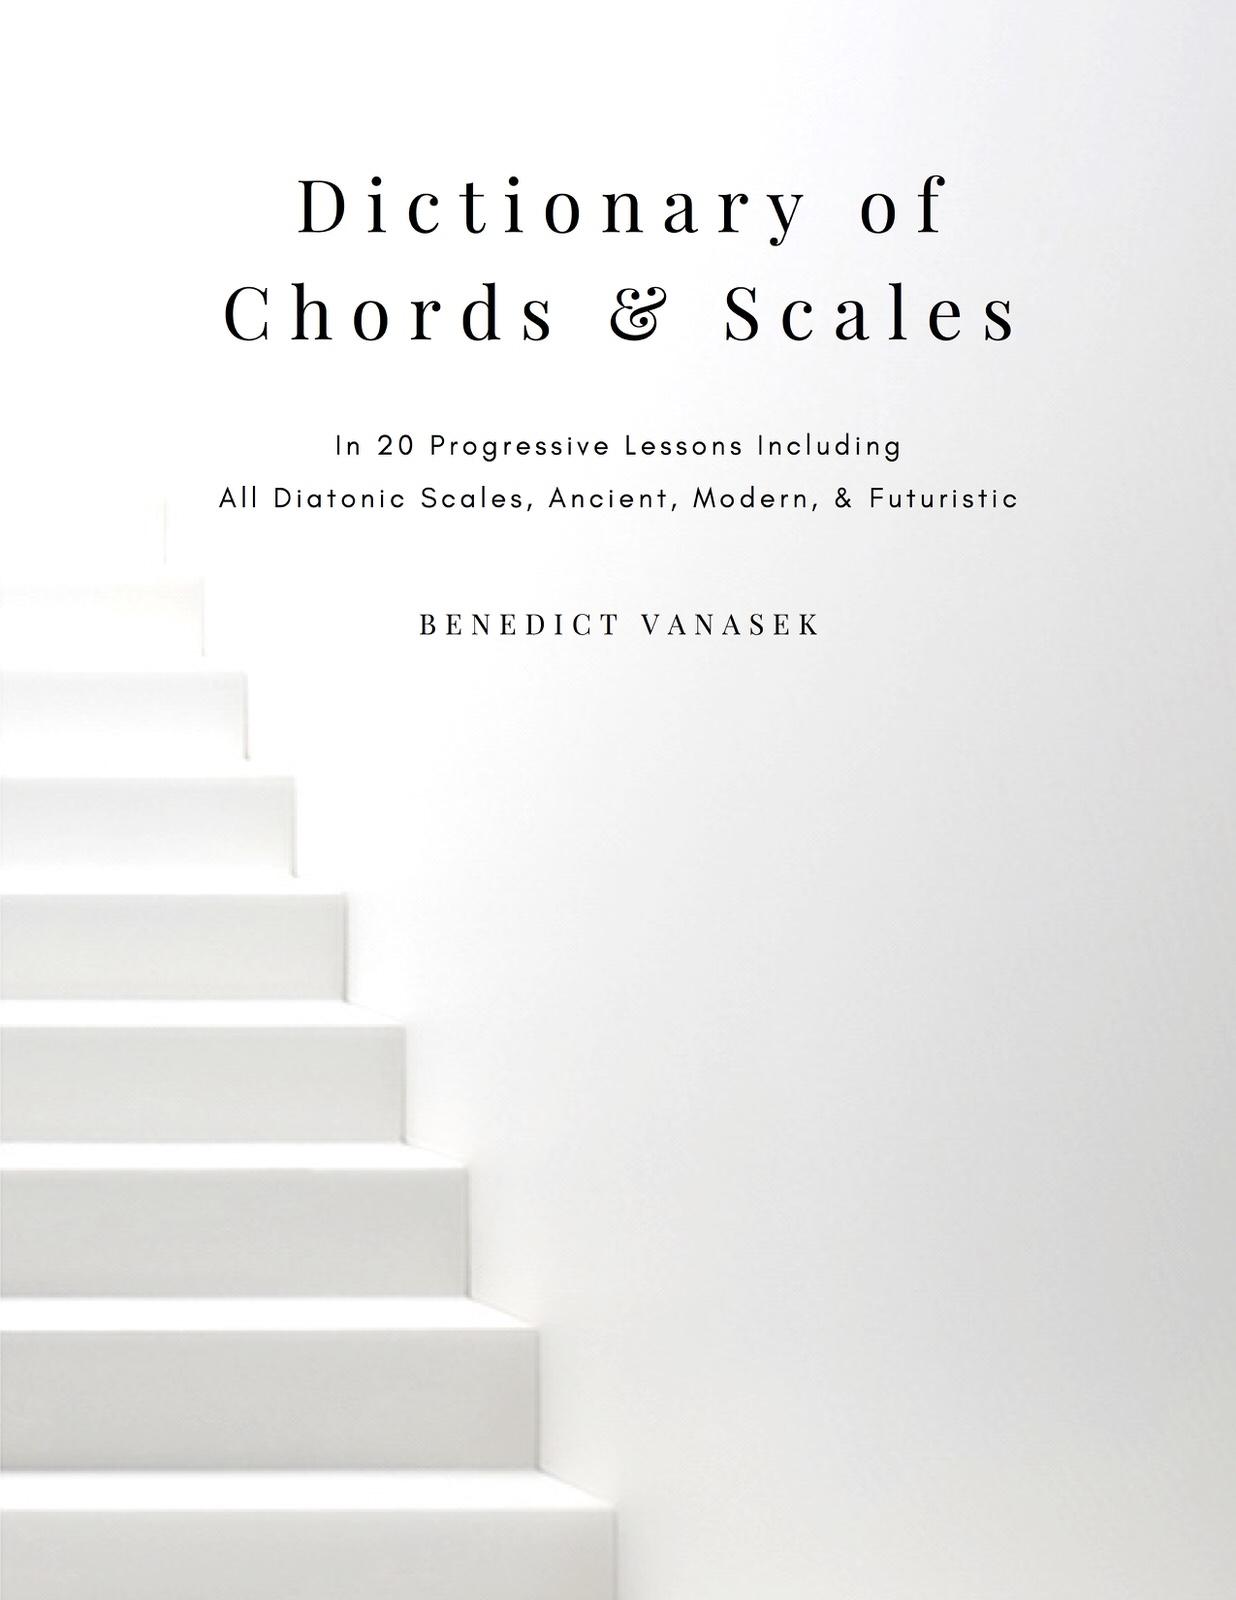 Vanasek, Dictionary of Chords & Scales in 20 Progressive Lessons-p01